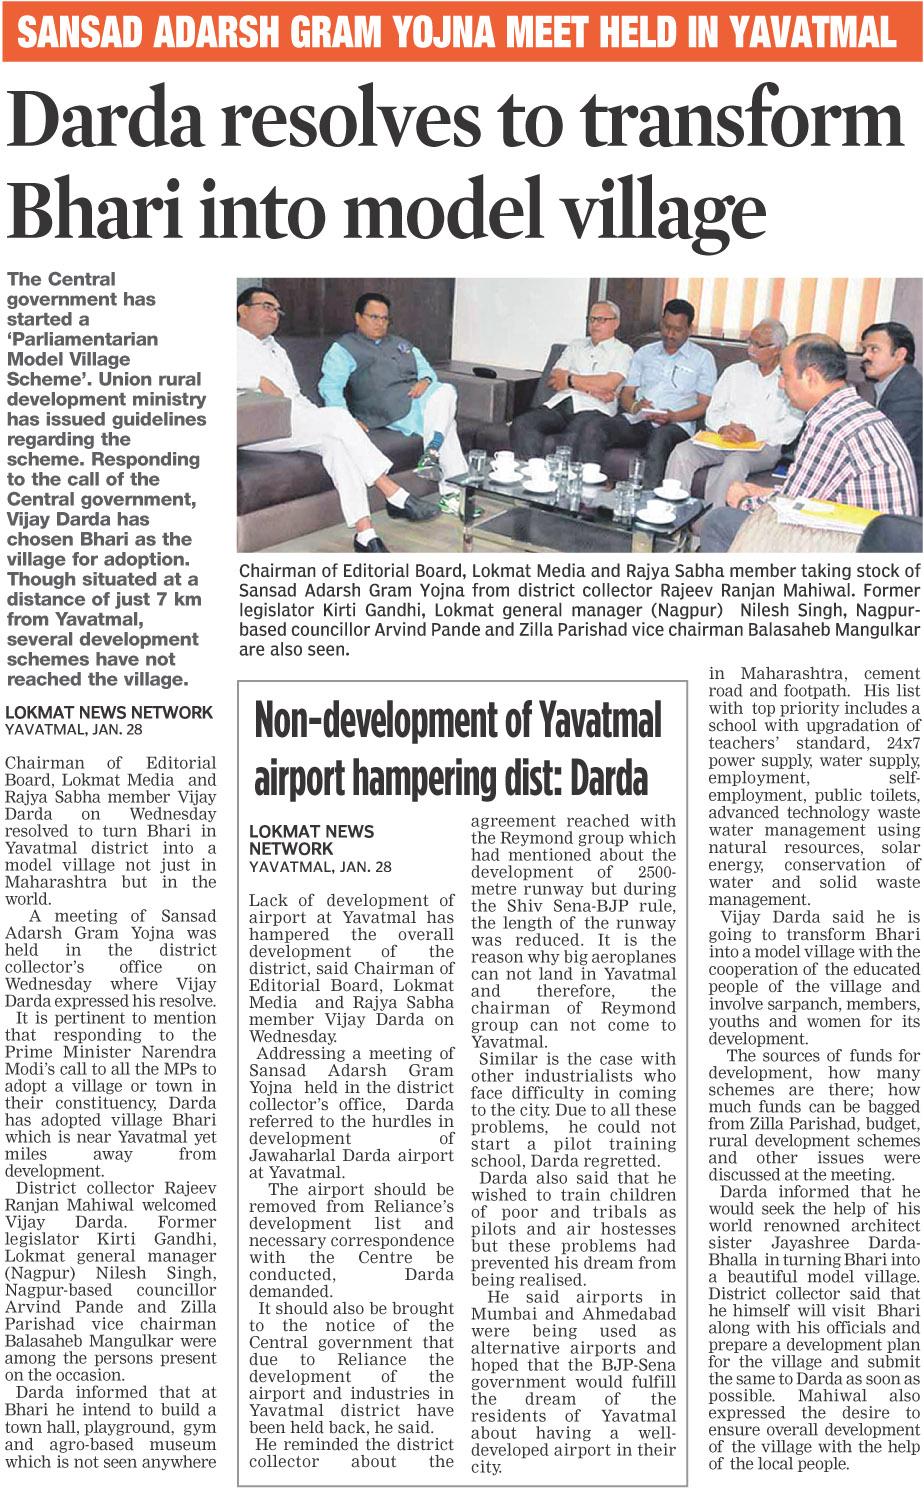 Darda resolves to transform Bhari into model village